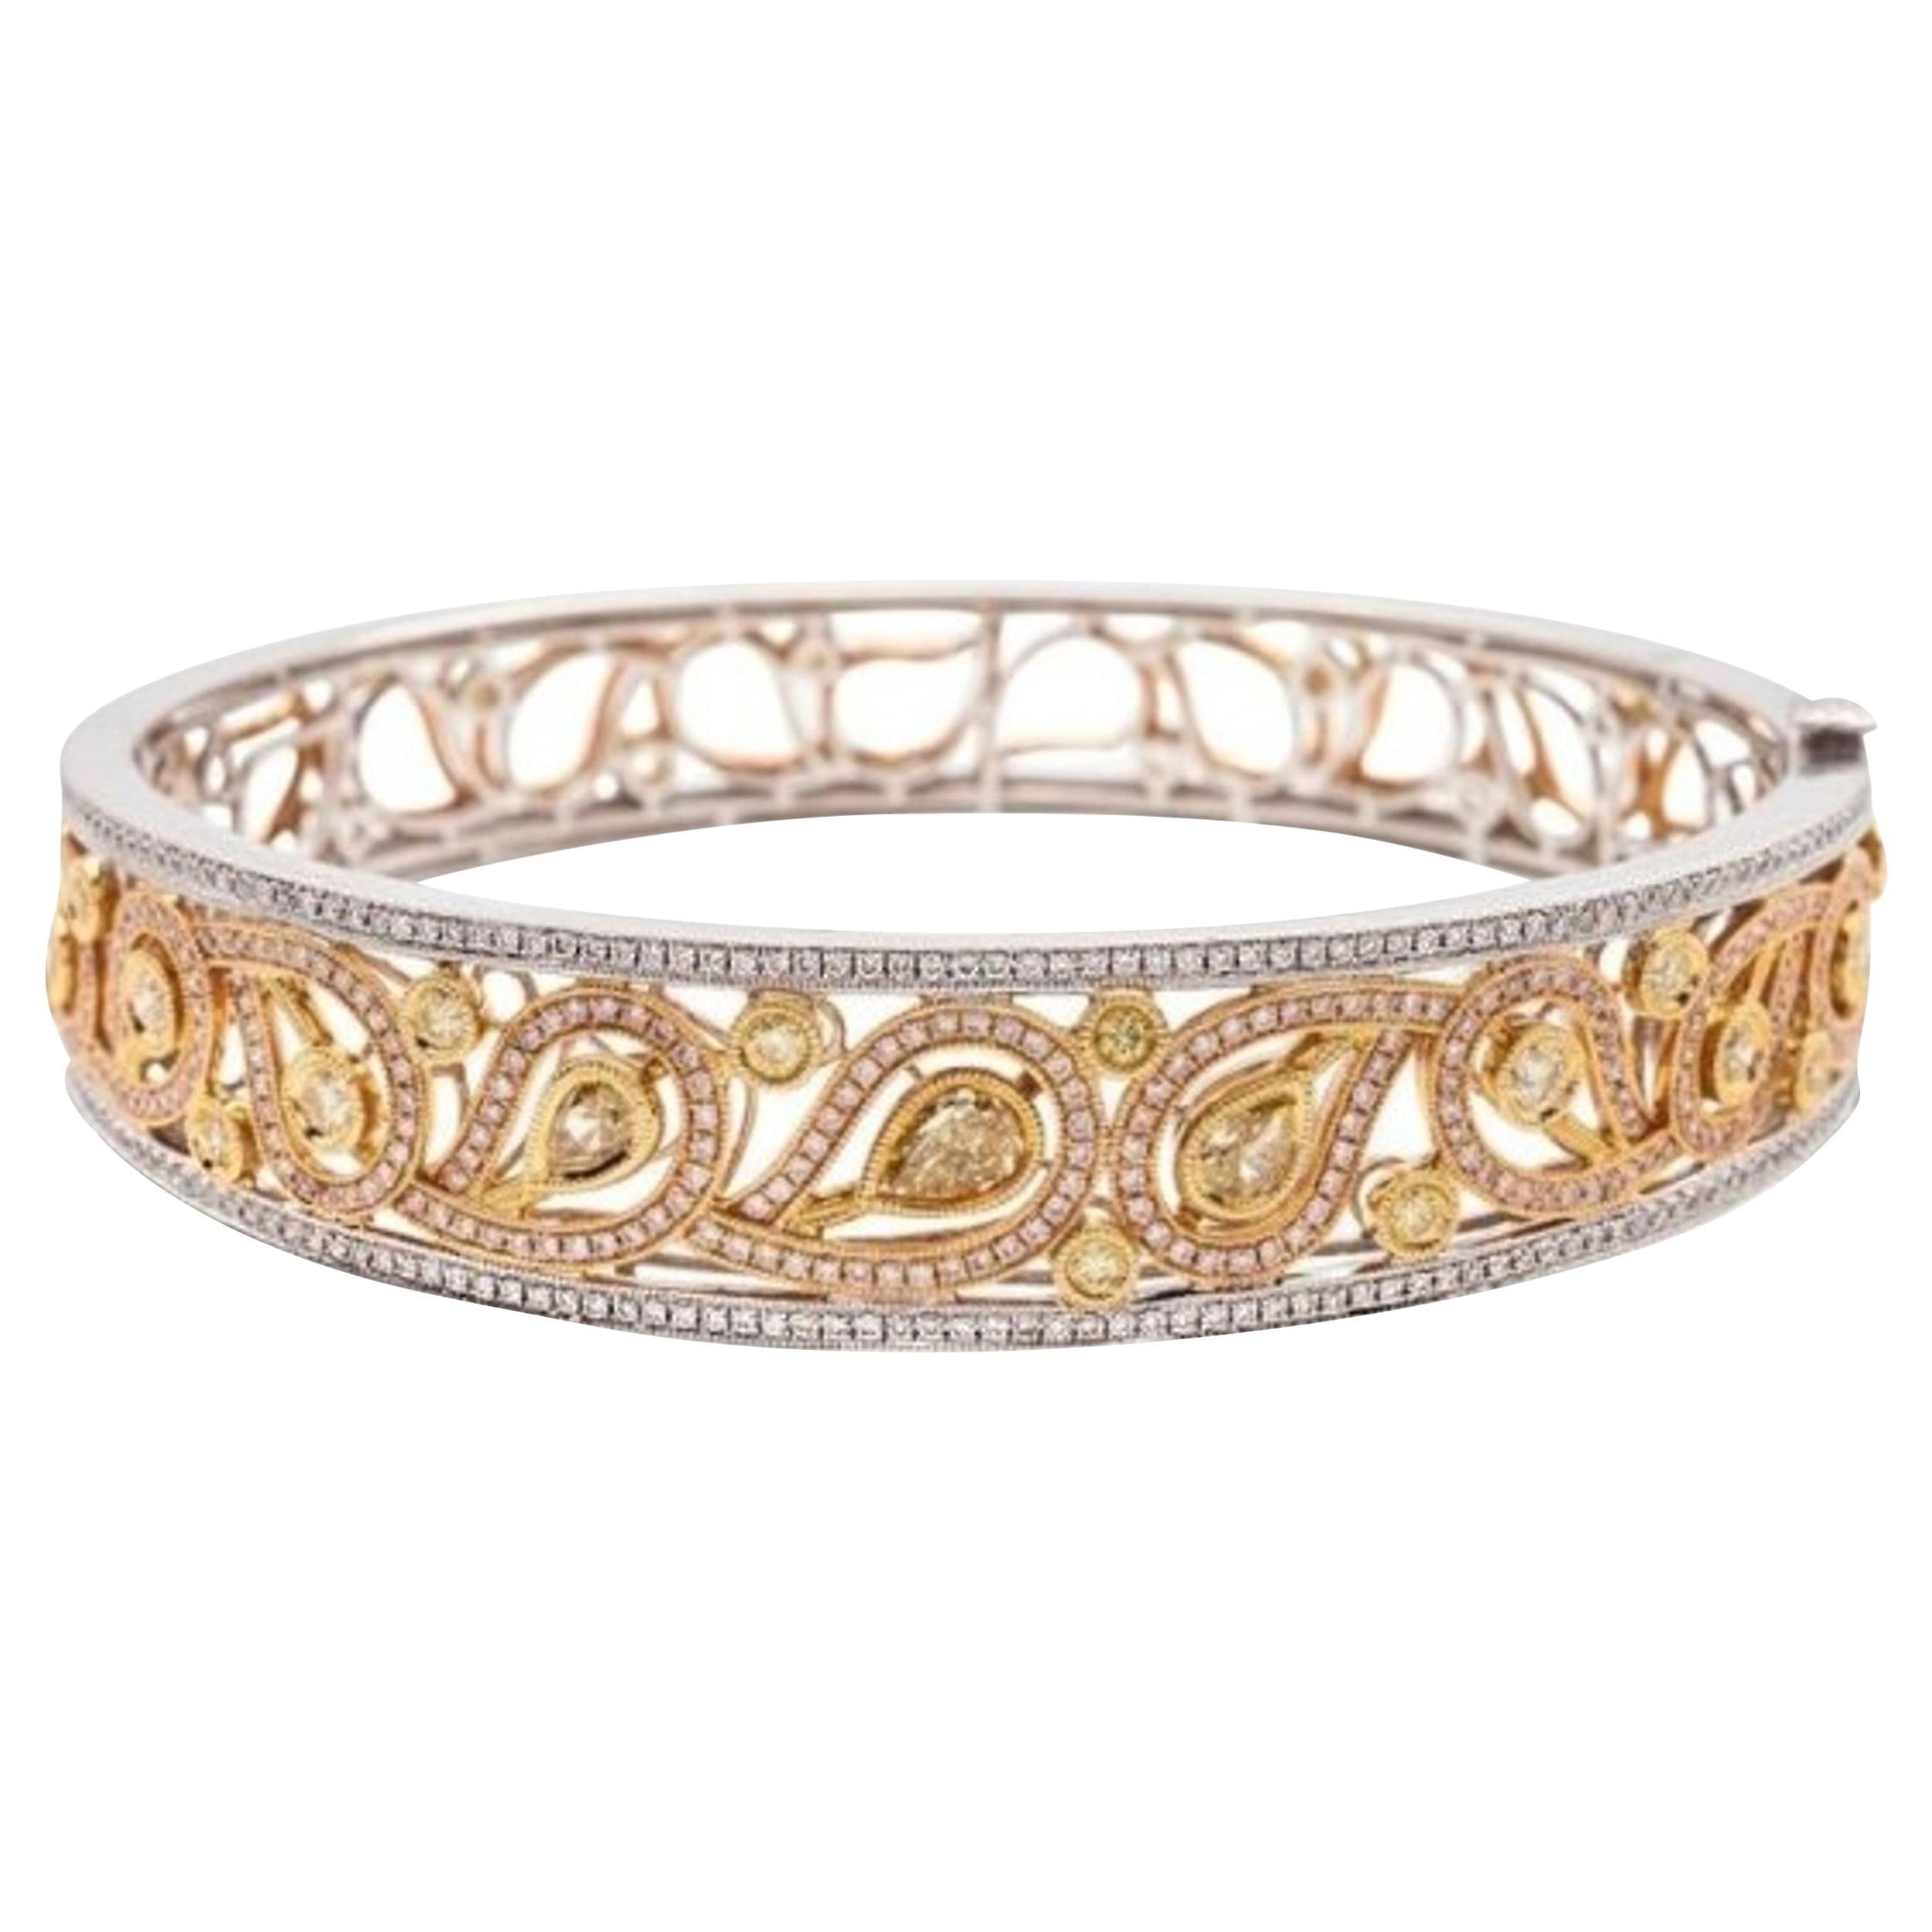 Fine Yellow Diamond Bangle Bracelet, 18 Karat Gold